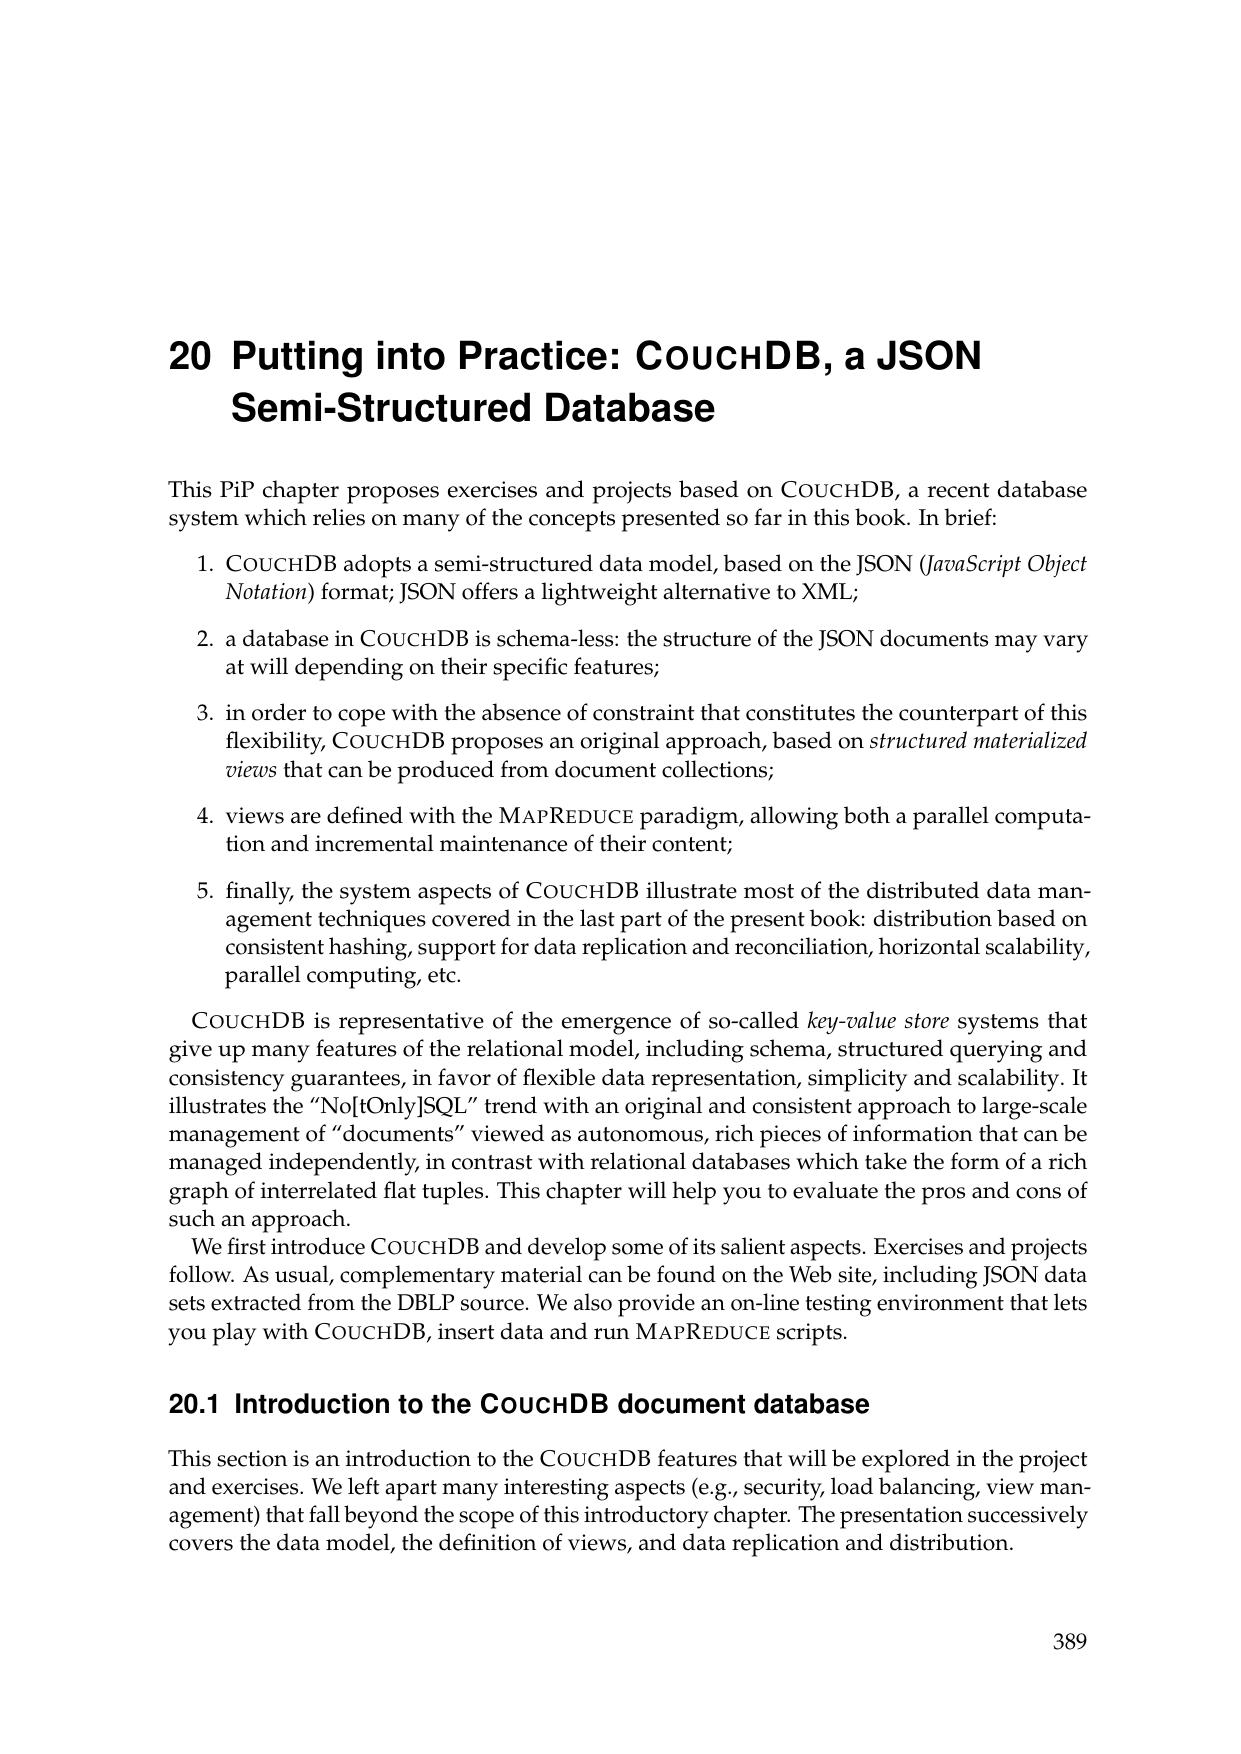 COUCHDB, a JSON Semi-Structured Database | manualzz com